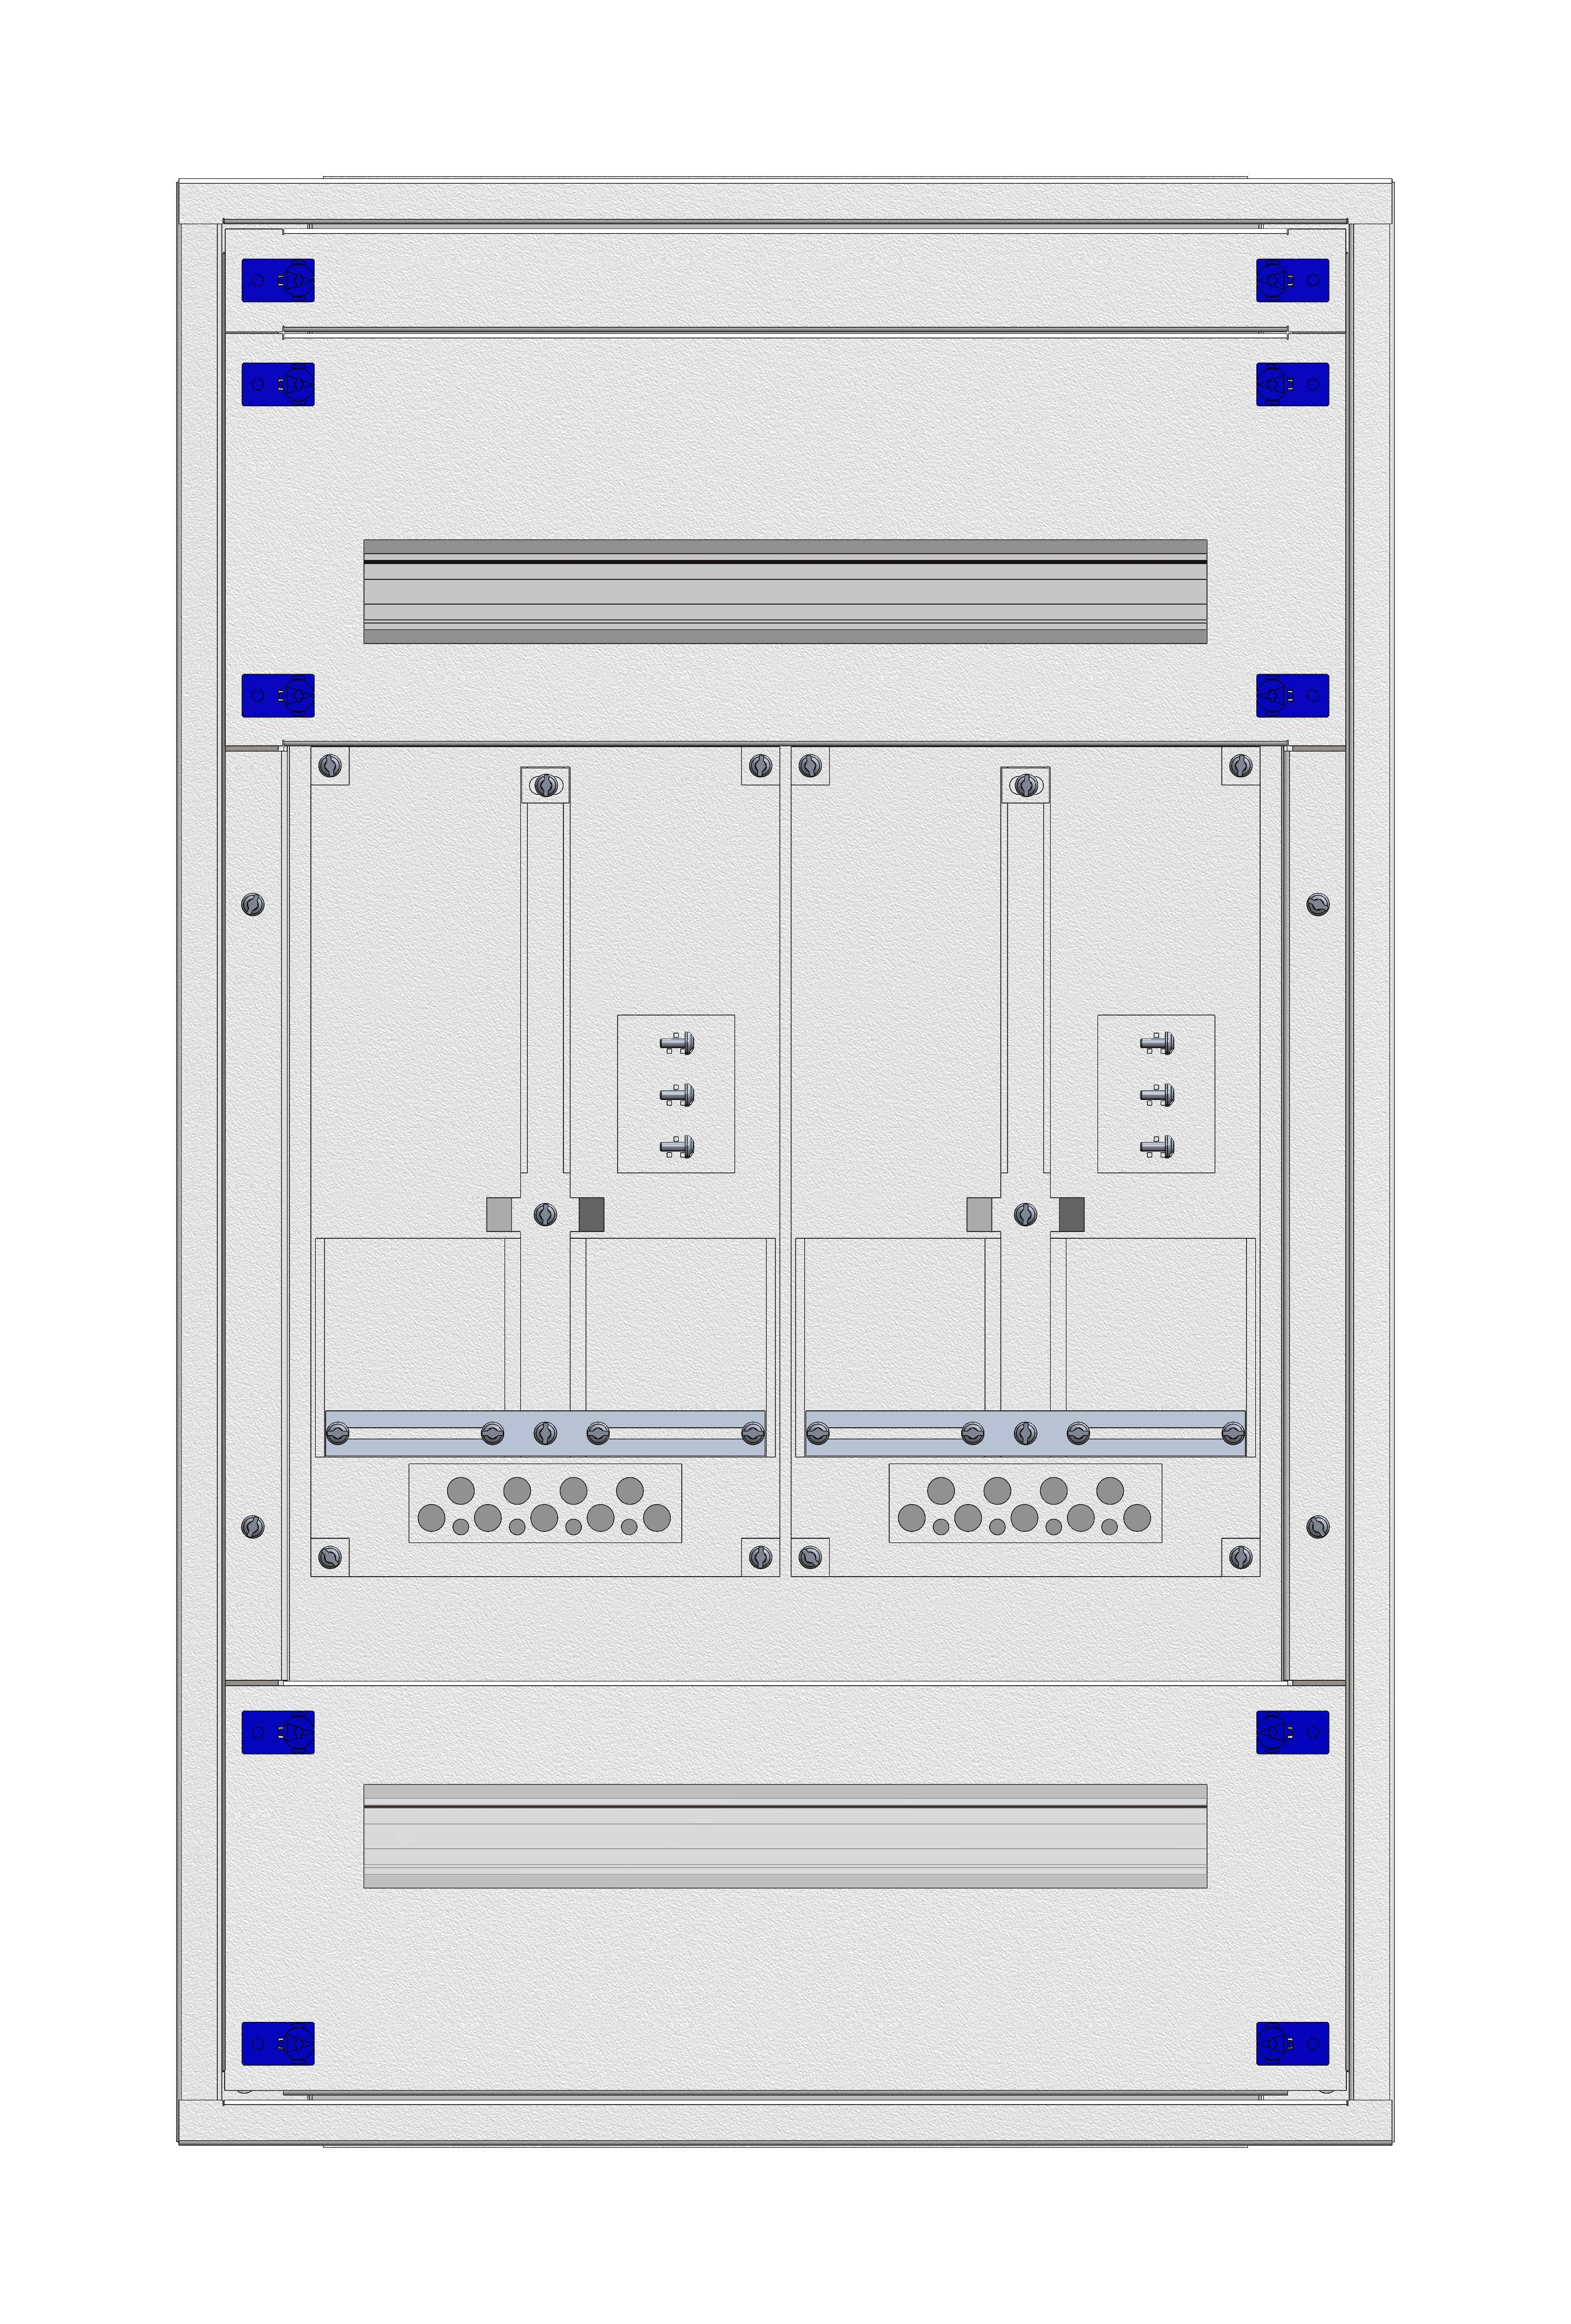 1 Stk Aufputz-Zählerverteiler 2A-18E/VBG 2ZP, H915B590T250mm IL160218VS